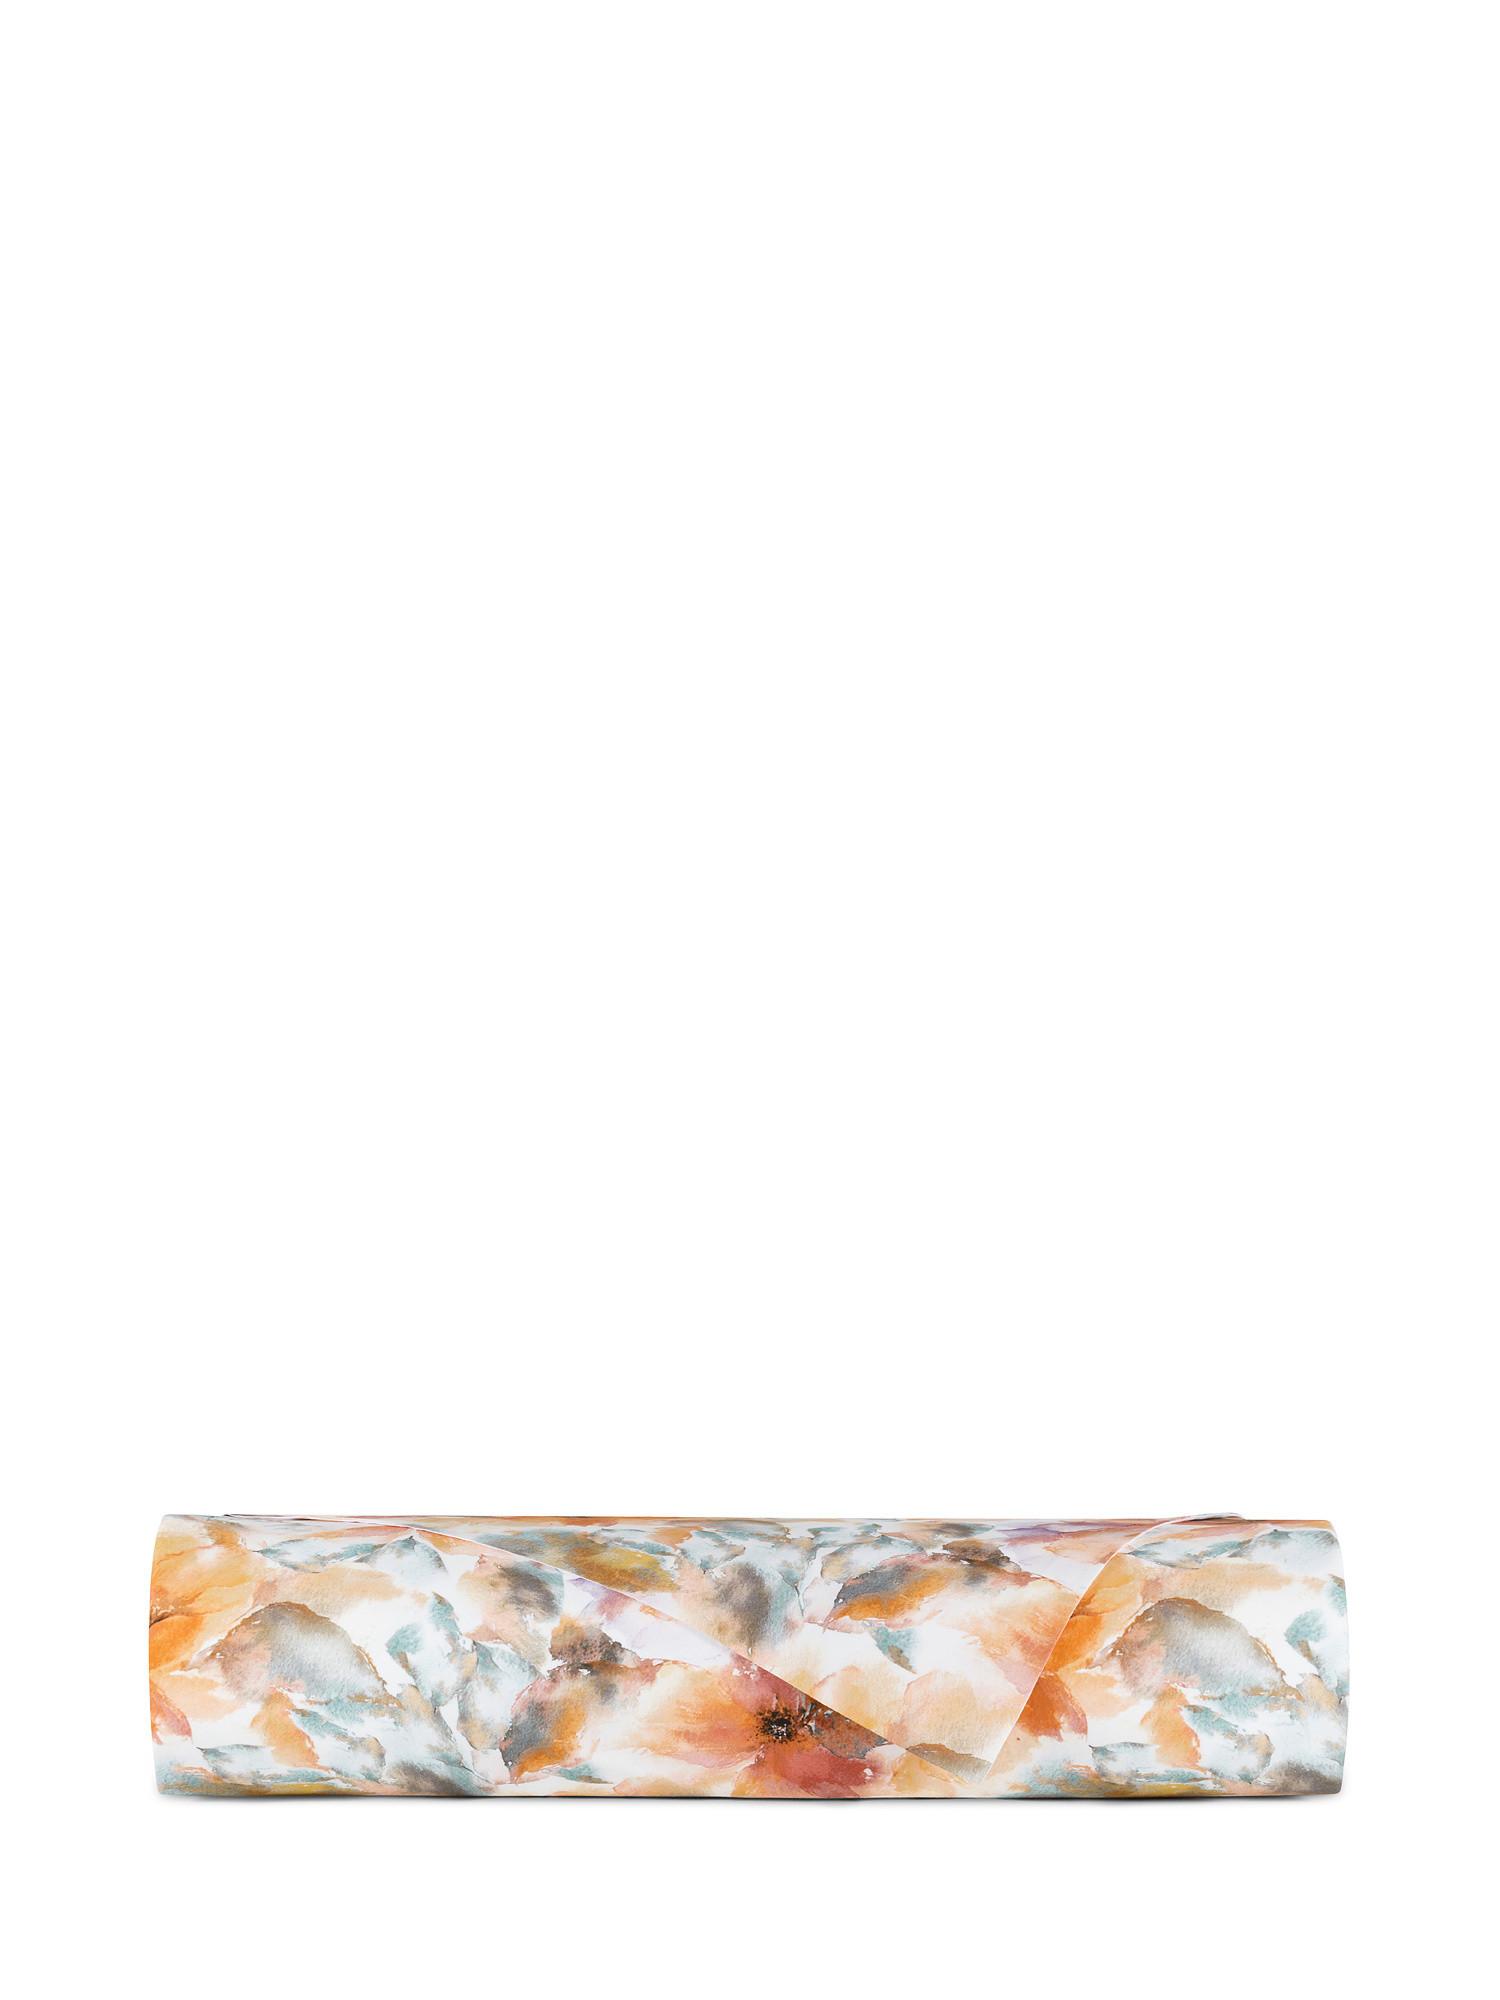 Lenzuolo liscio cotone percalle fantasia autunnale, Multicolor, large image number 1